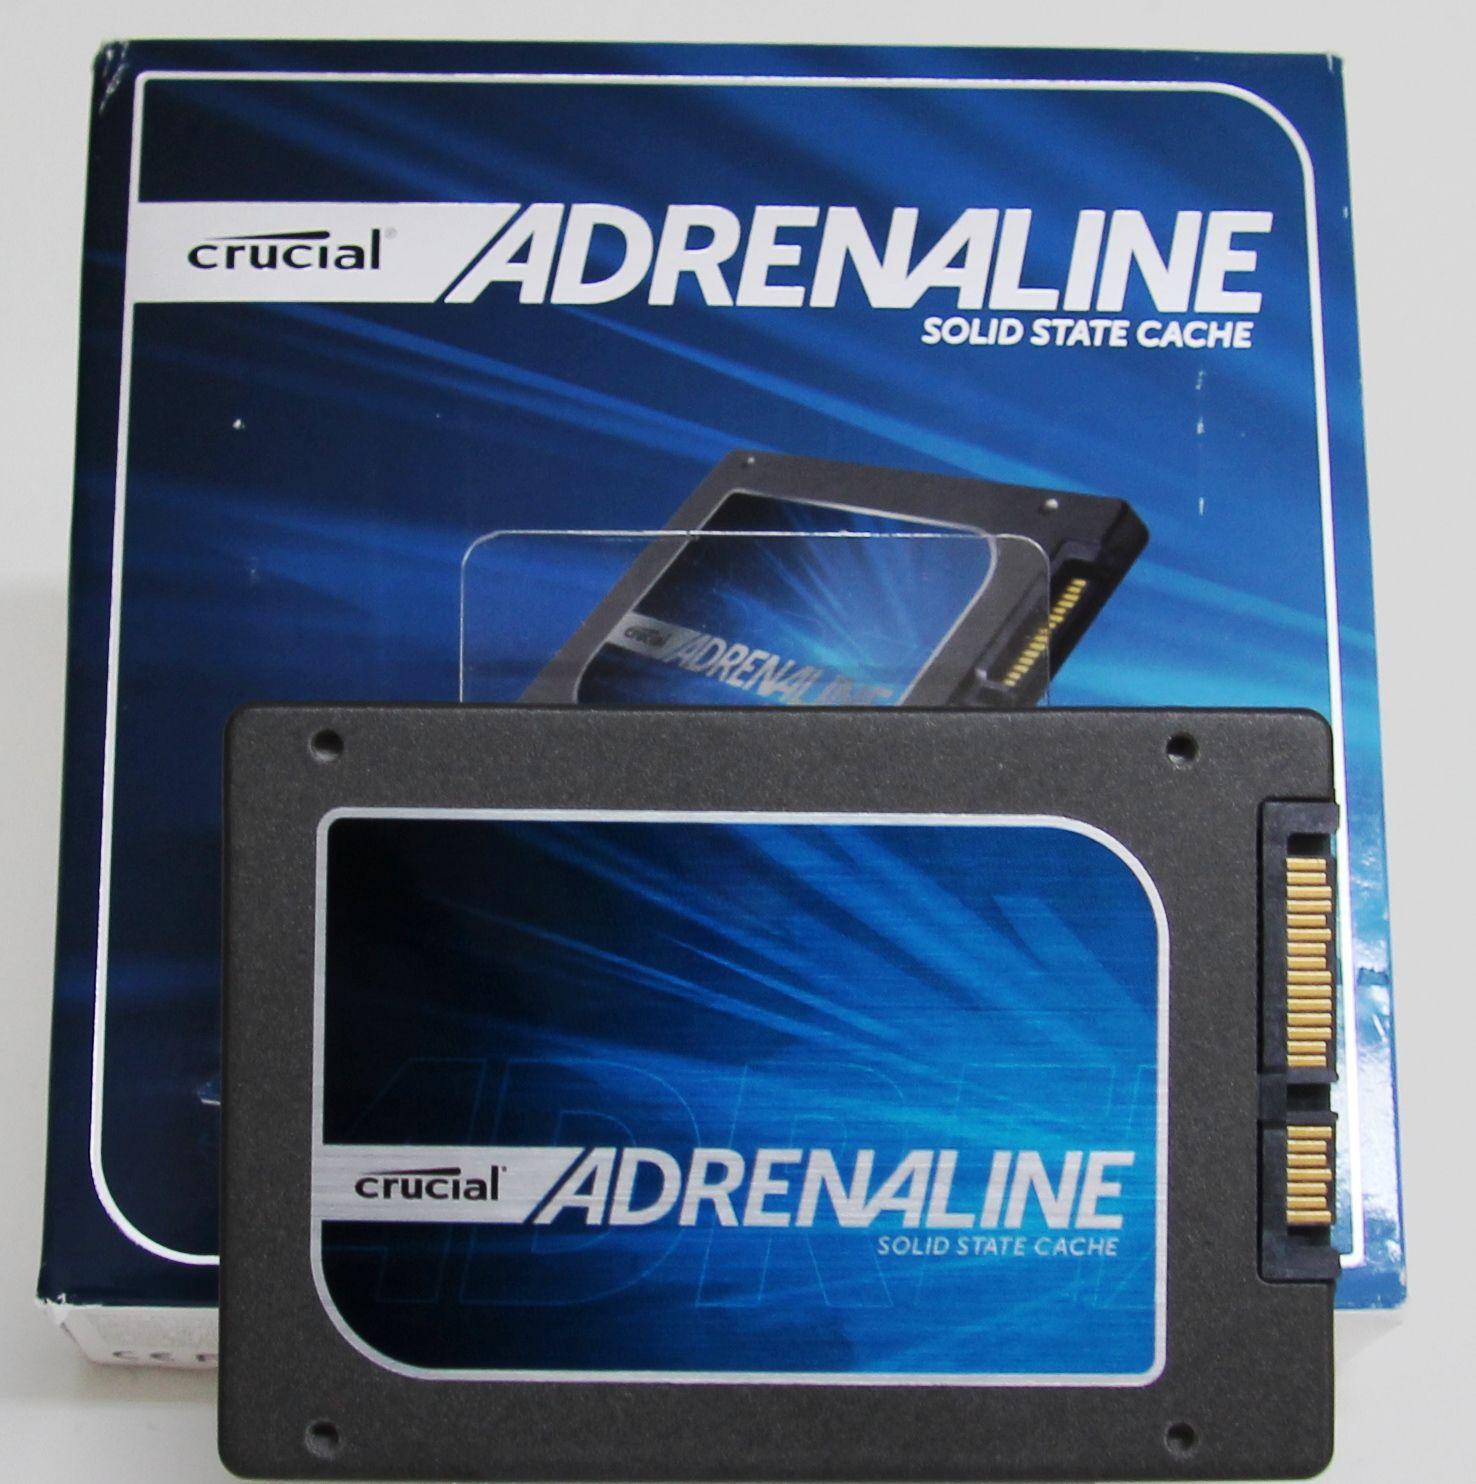 crucial-adrenaline-50-gb-80.JPG?nocache=1332236108855